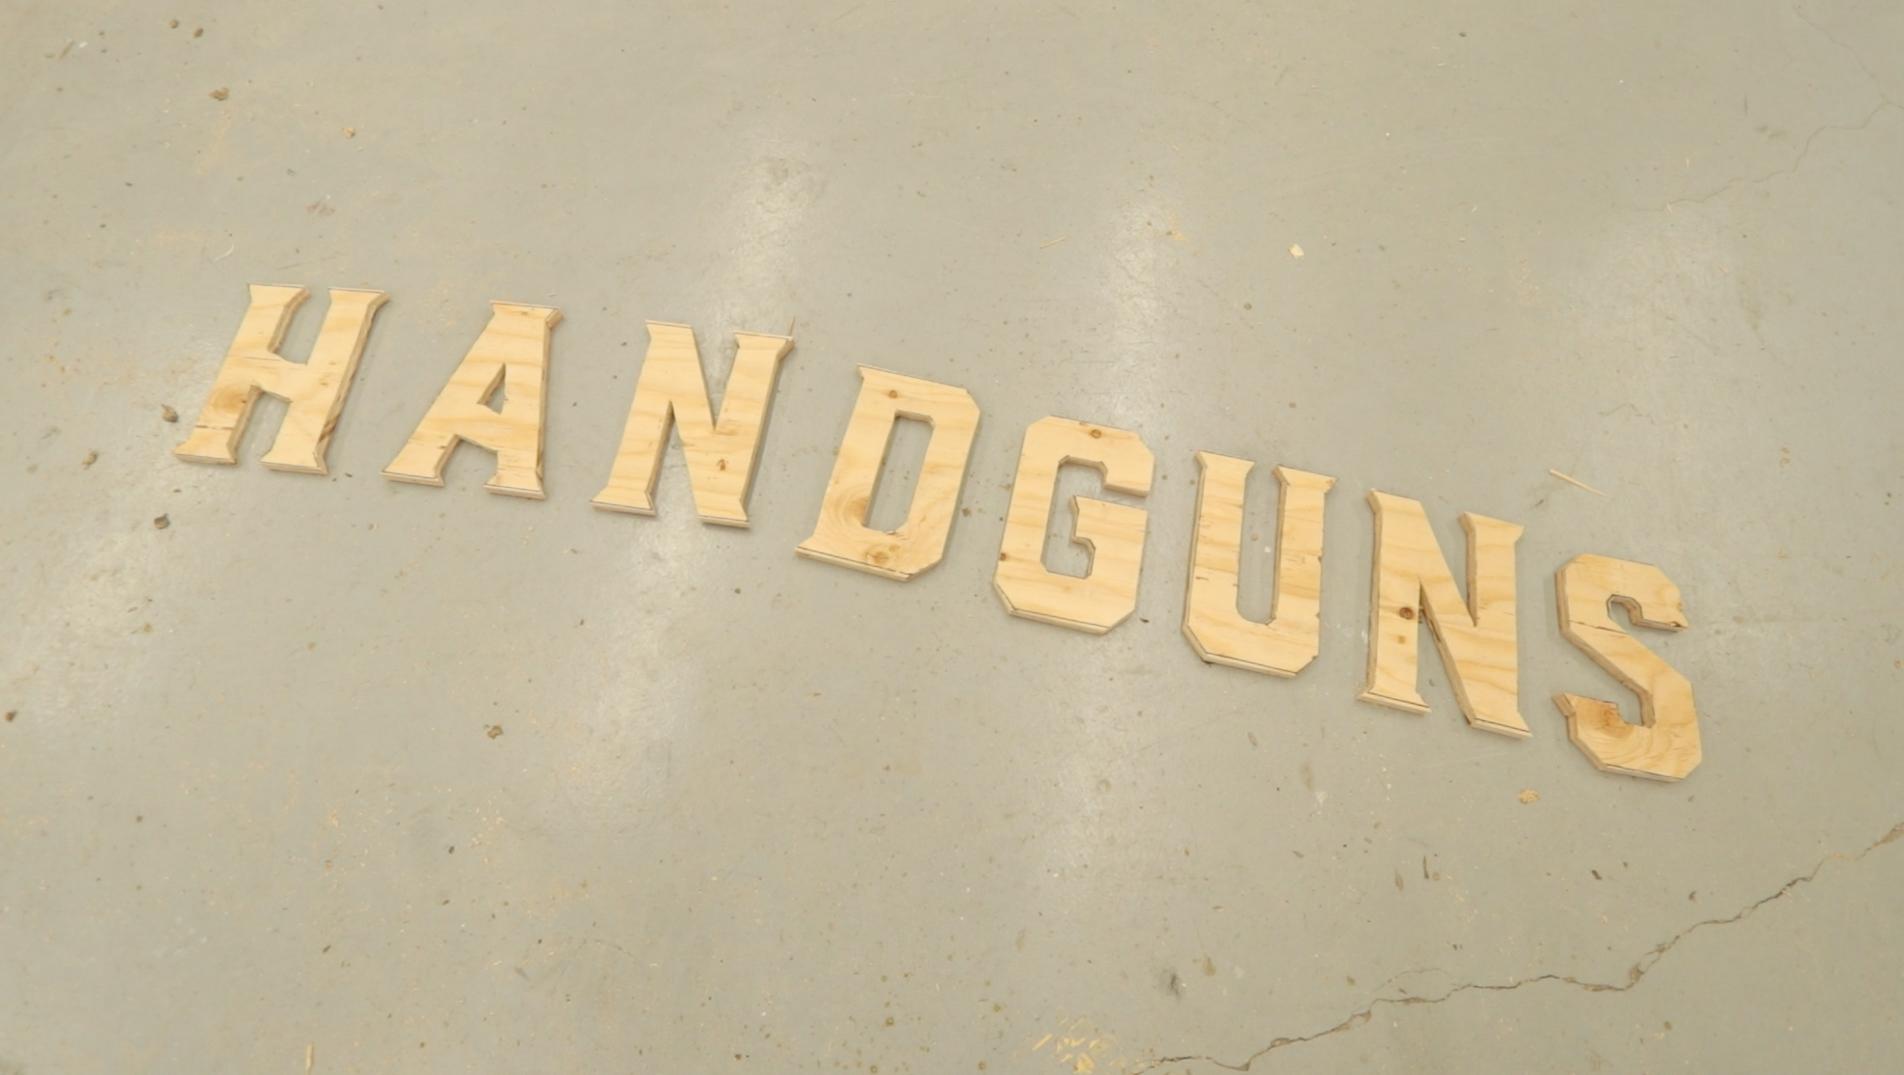 Millcreek.handguns